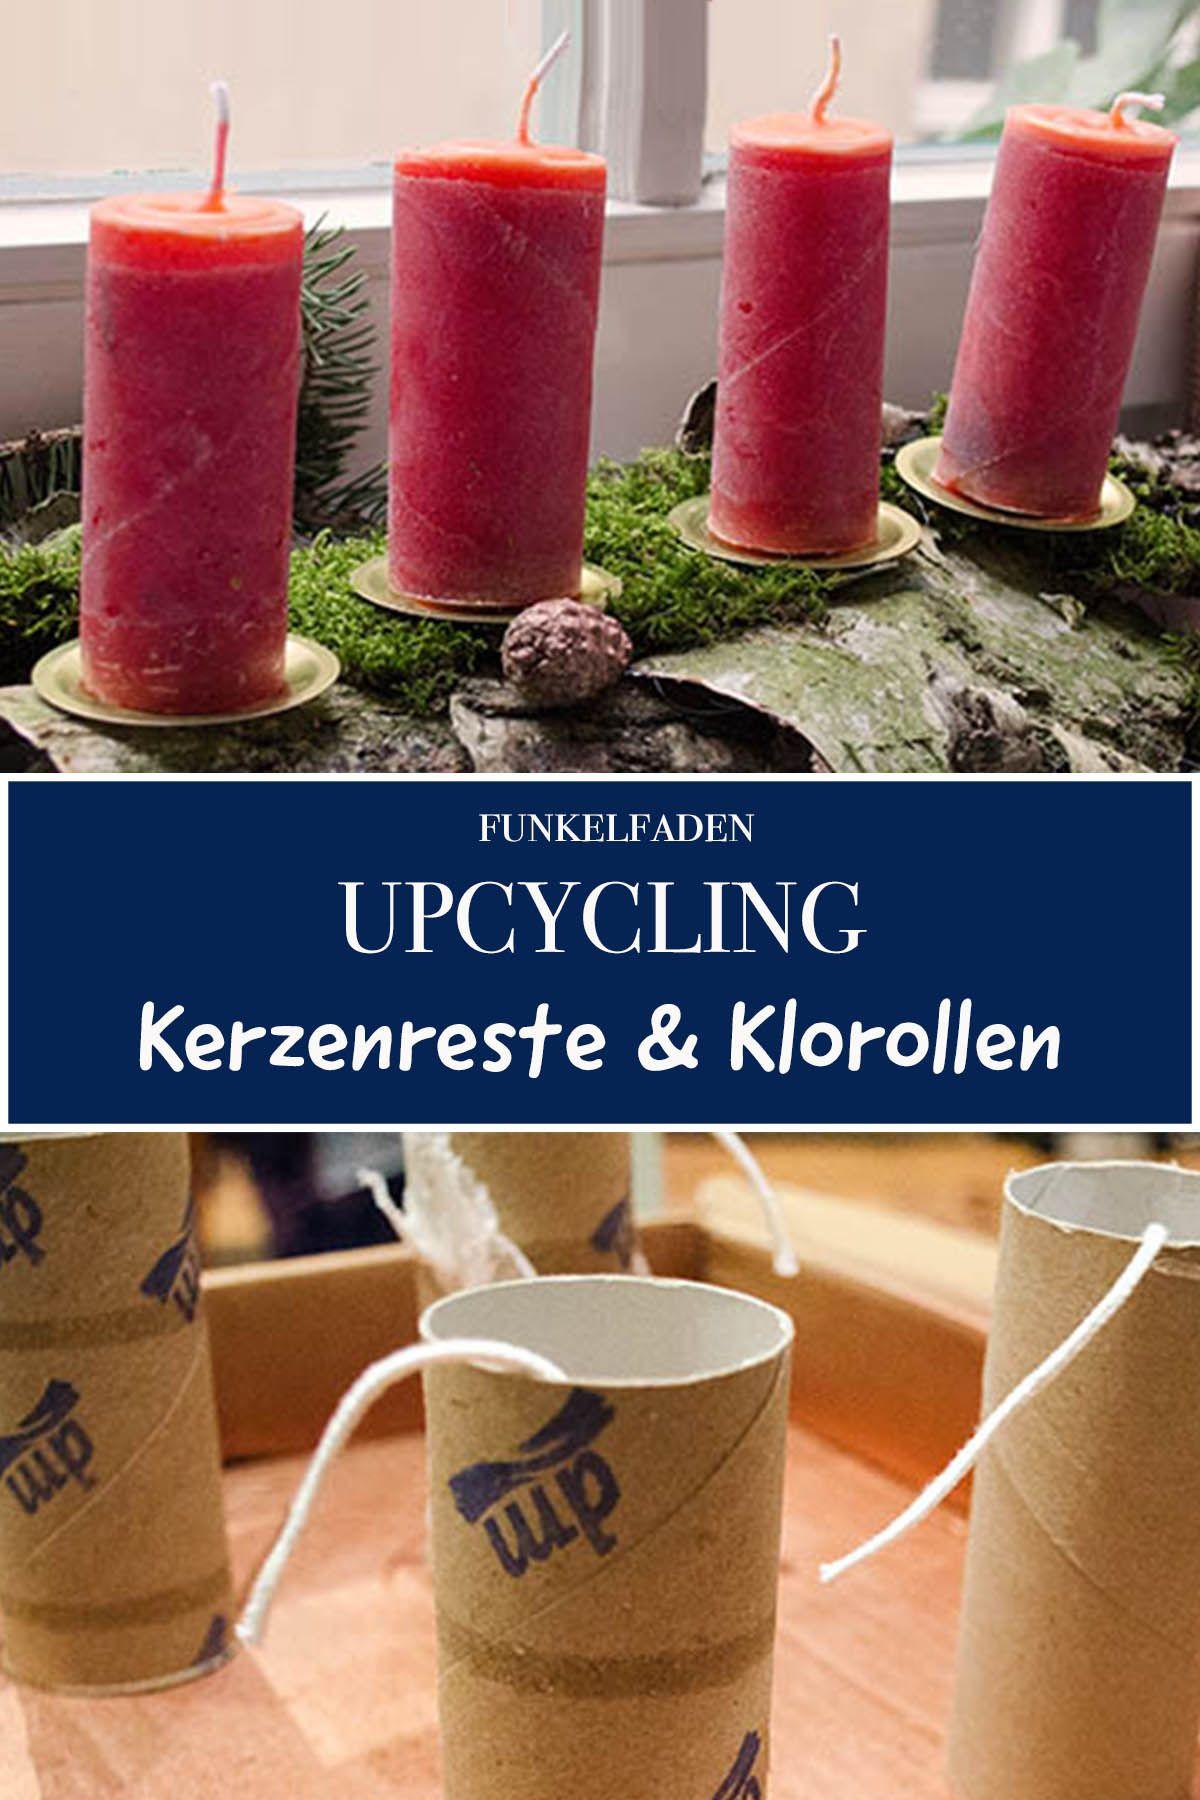 Photo of Anleitung – Upcycling Kerzen aus Kerzenresten und Klorollen gießen DIY